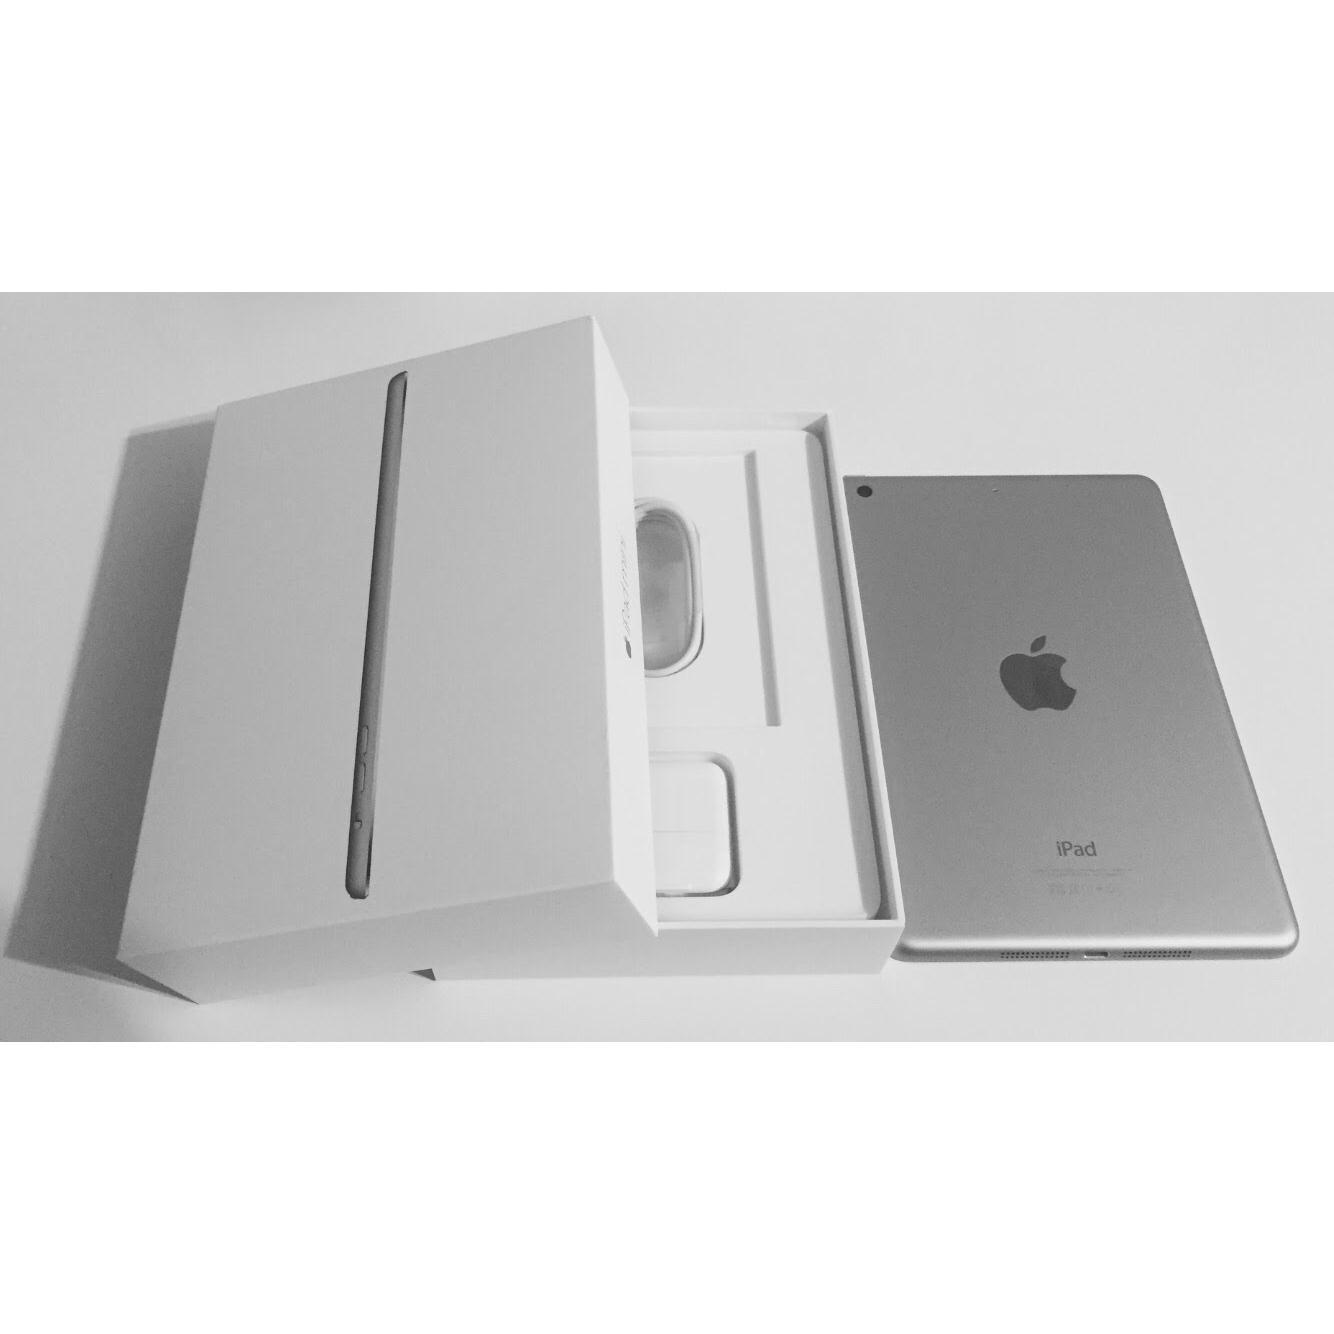 mini-4-4g-wifi-16g-gray-16g-99